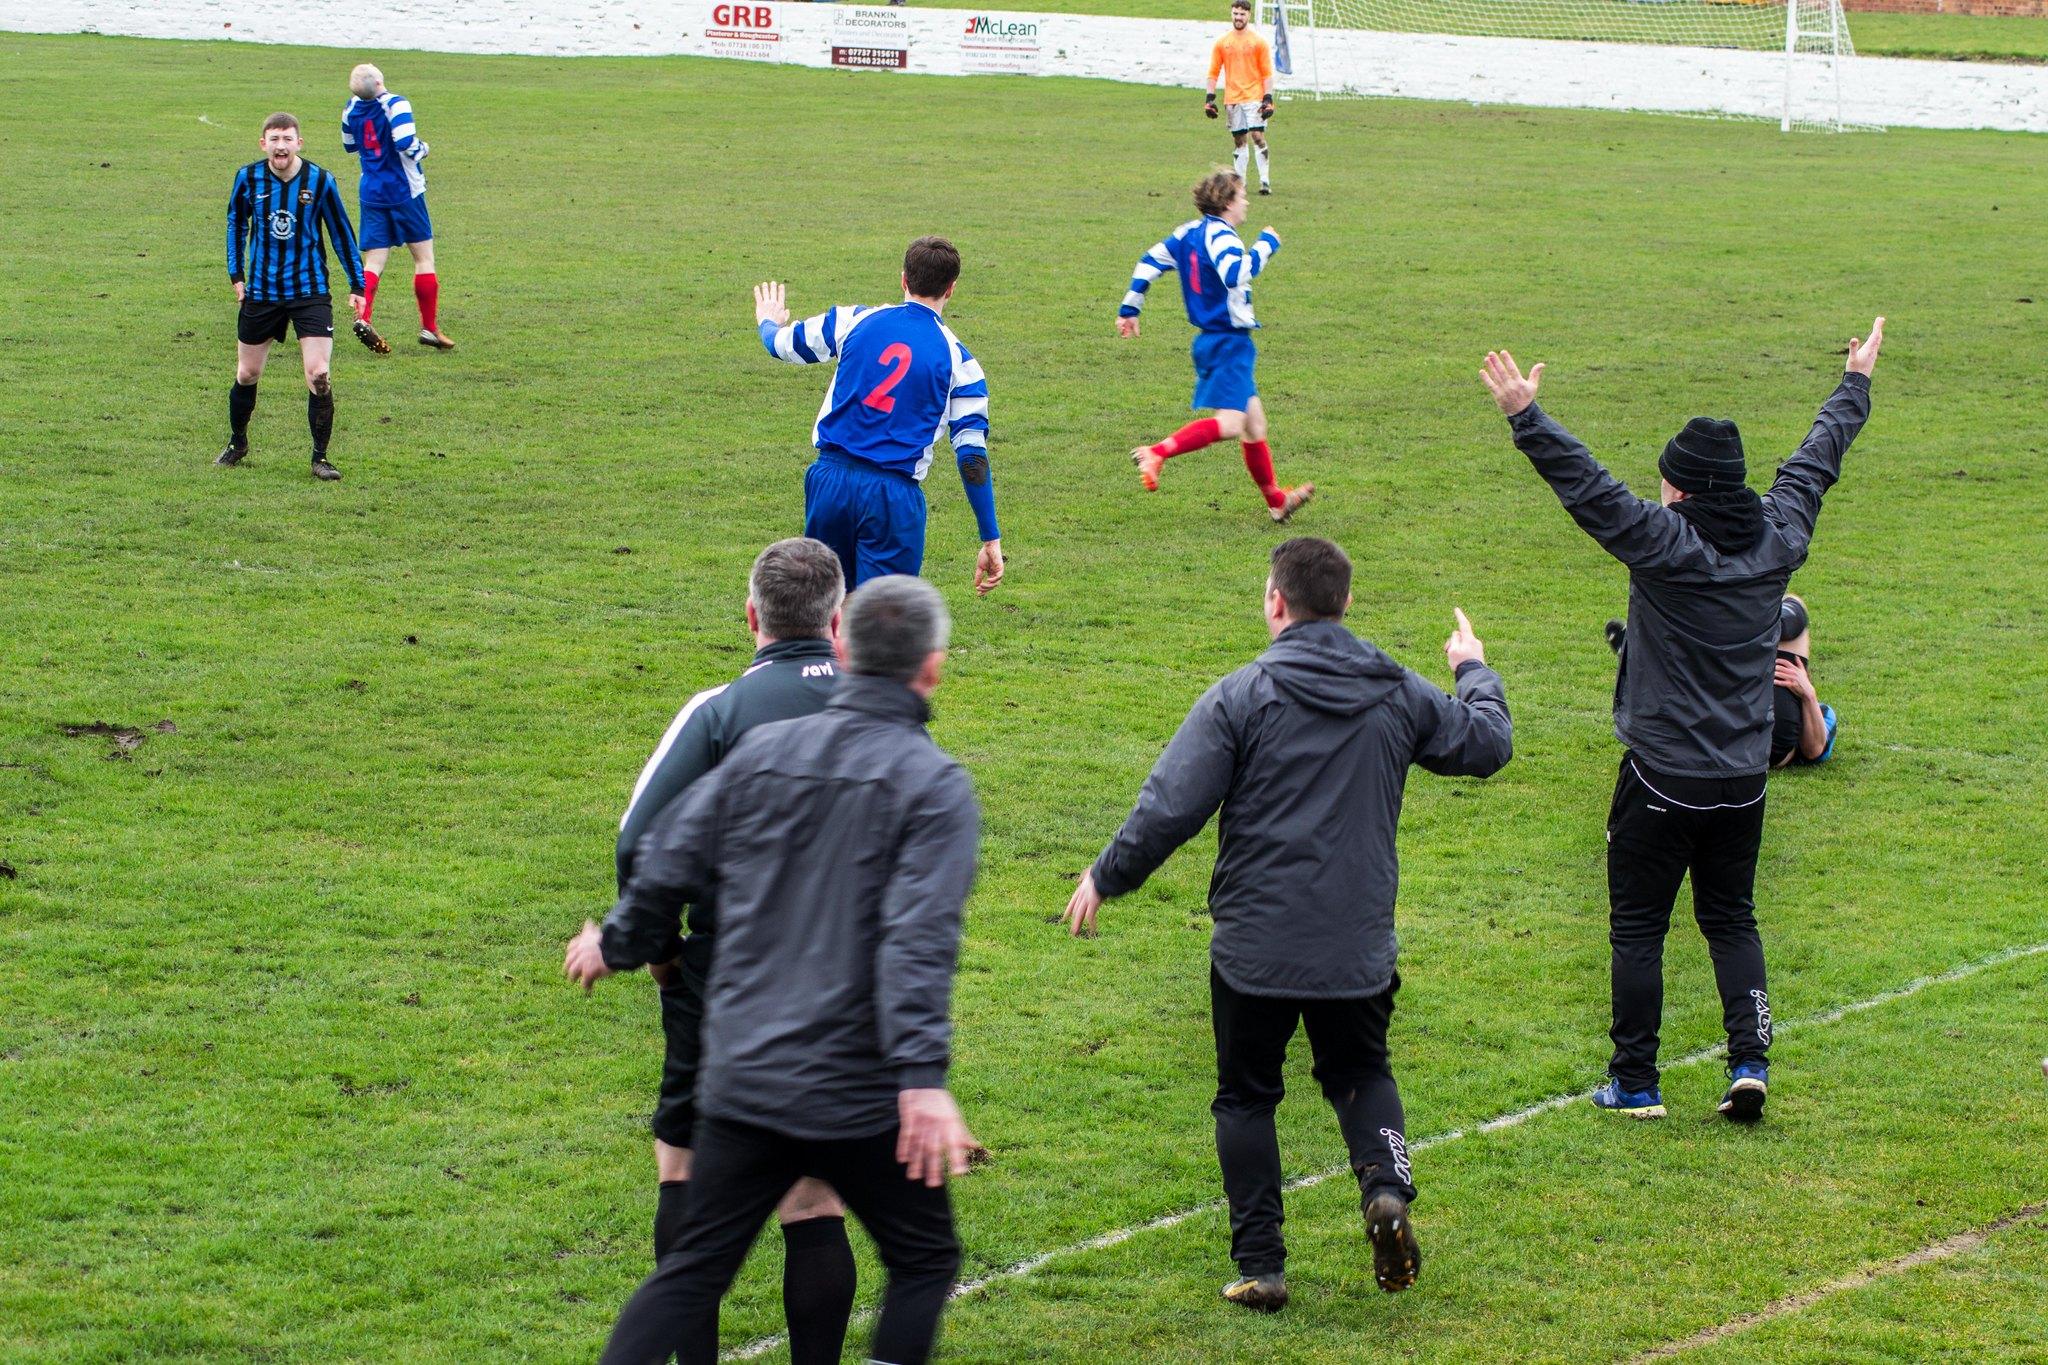 Referee!!!